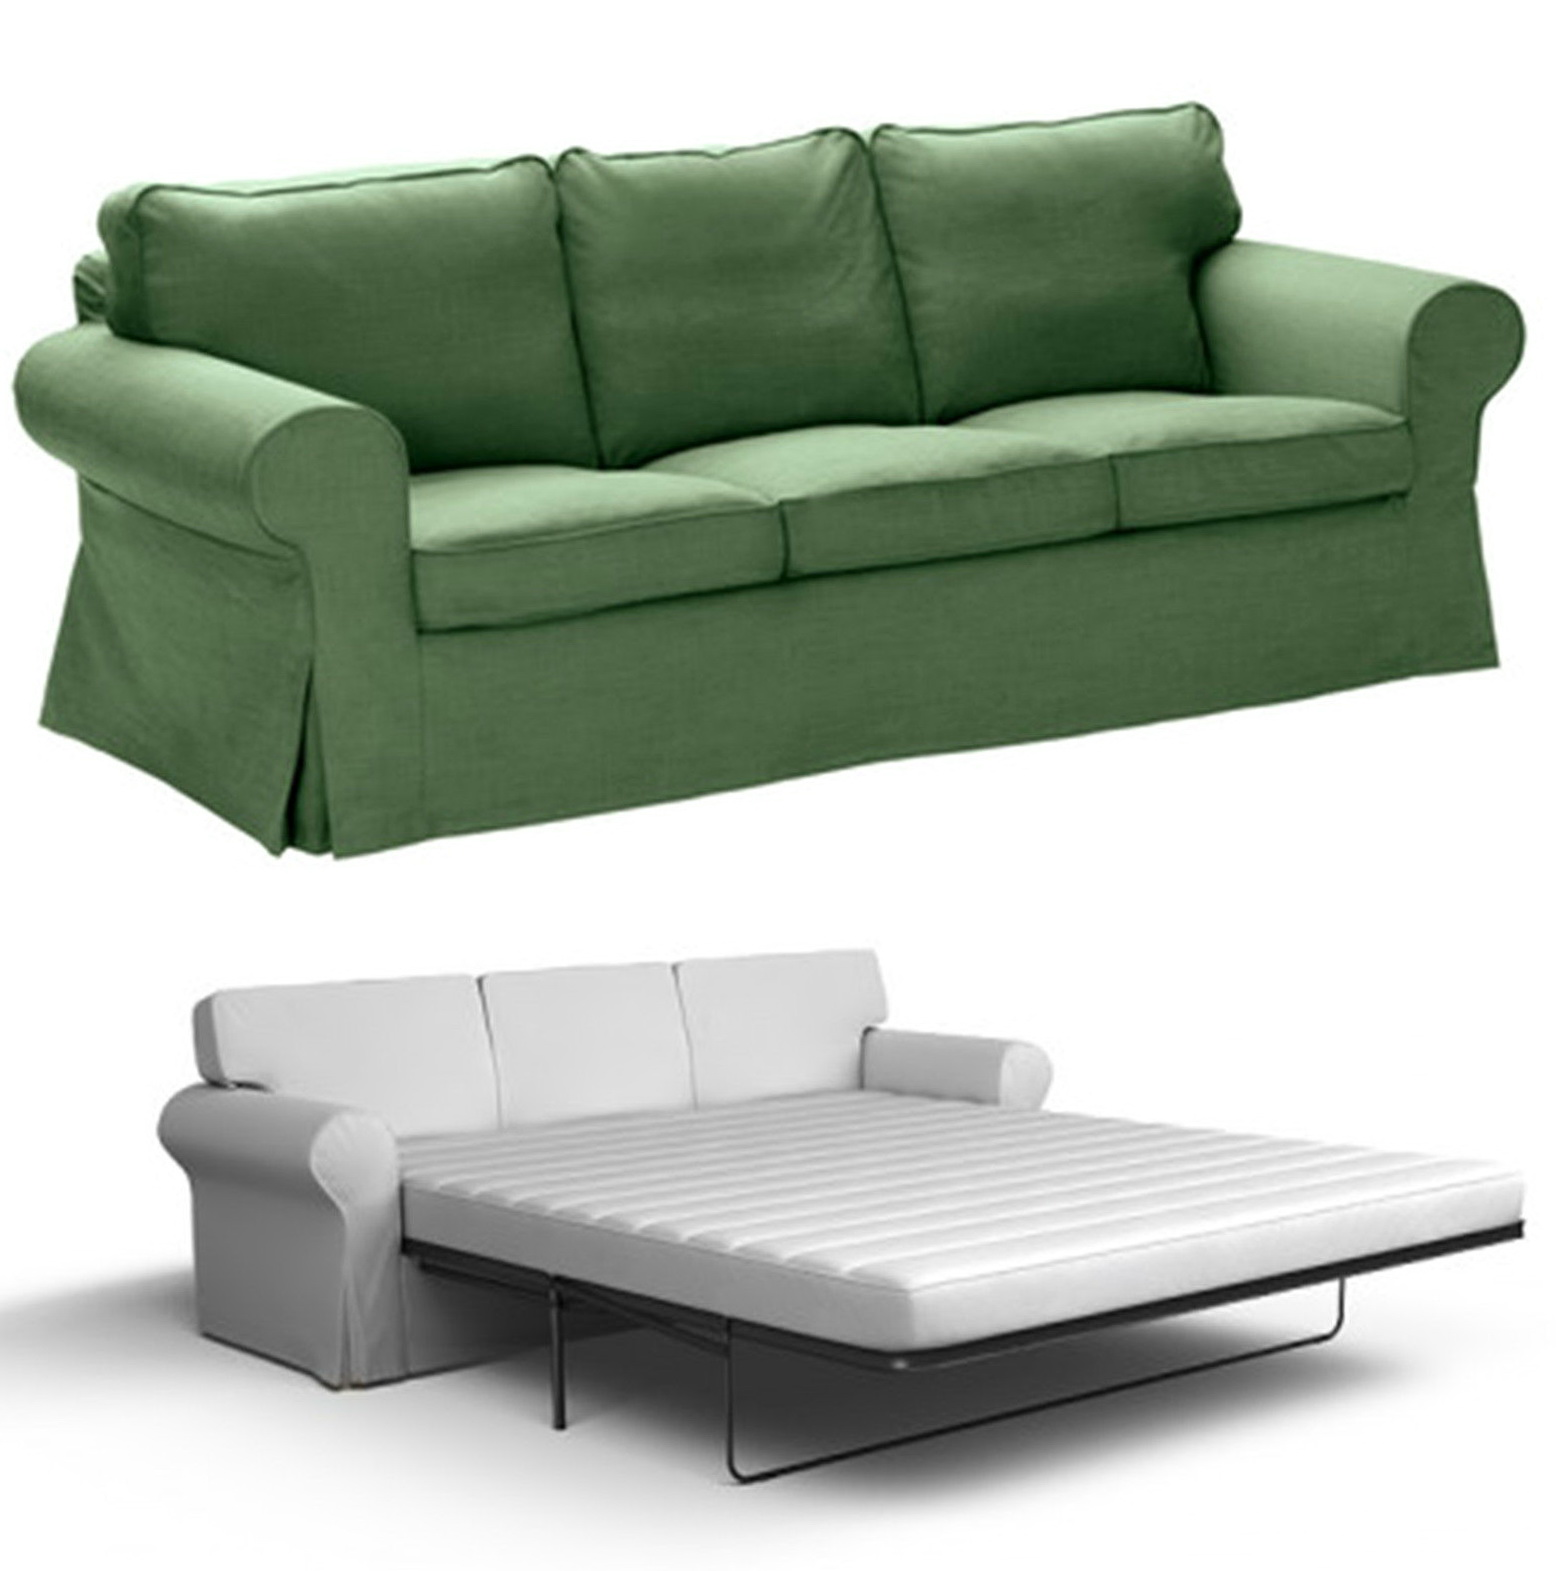 cheap corner sofa beds dublin mission style ikea ebay home design ideas